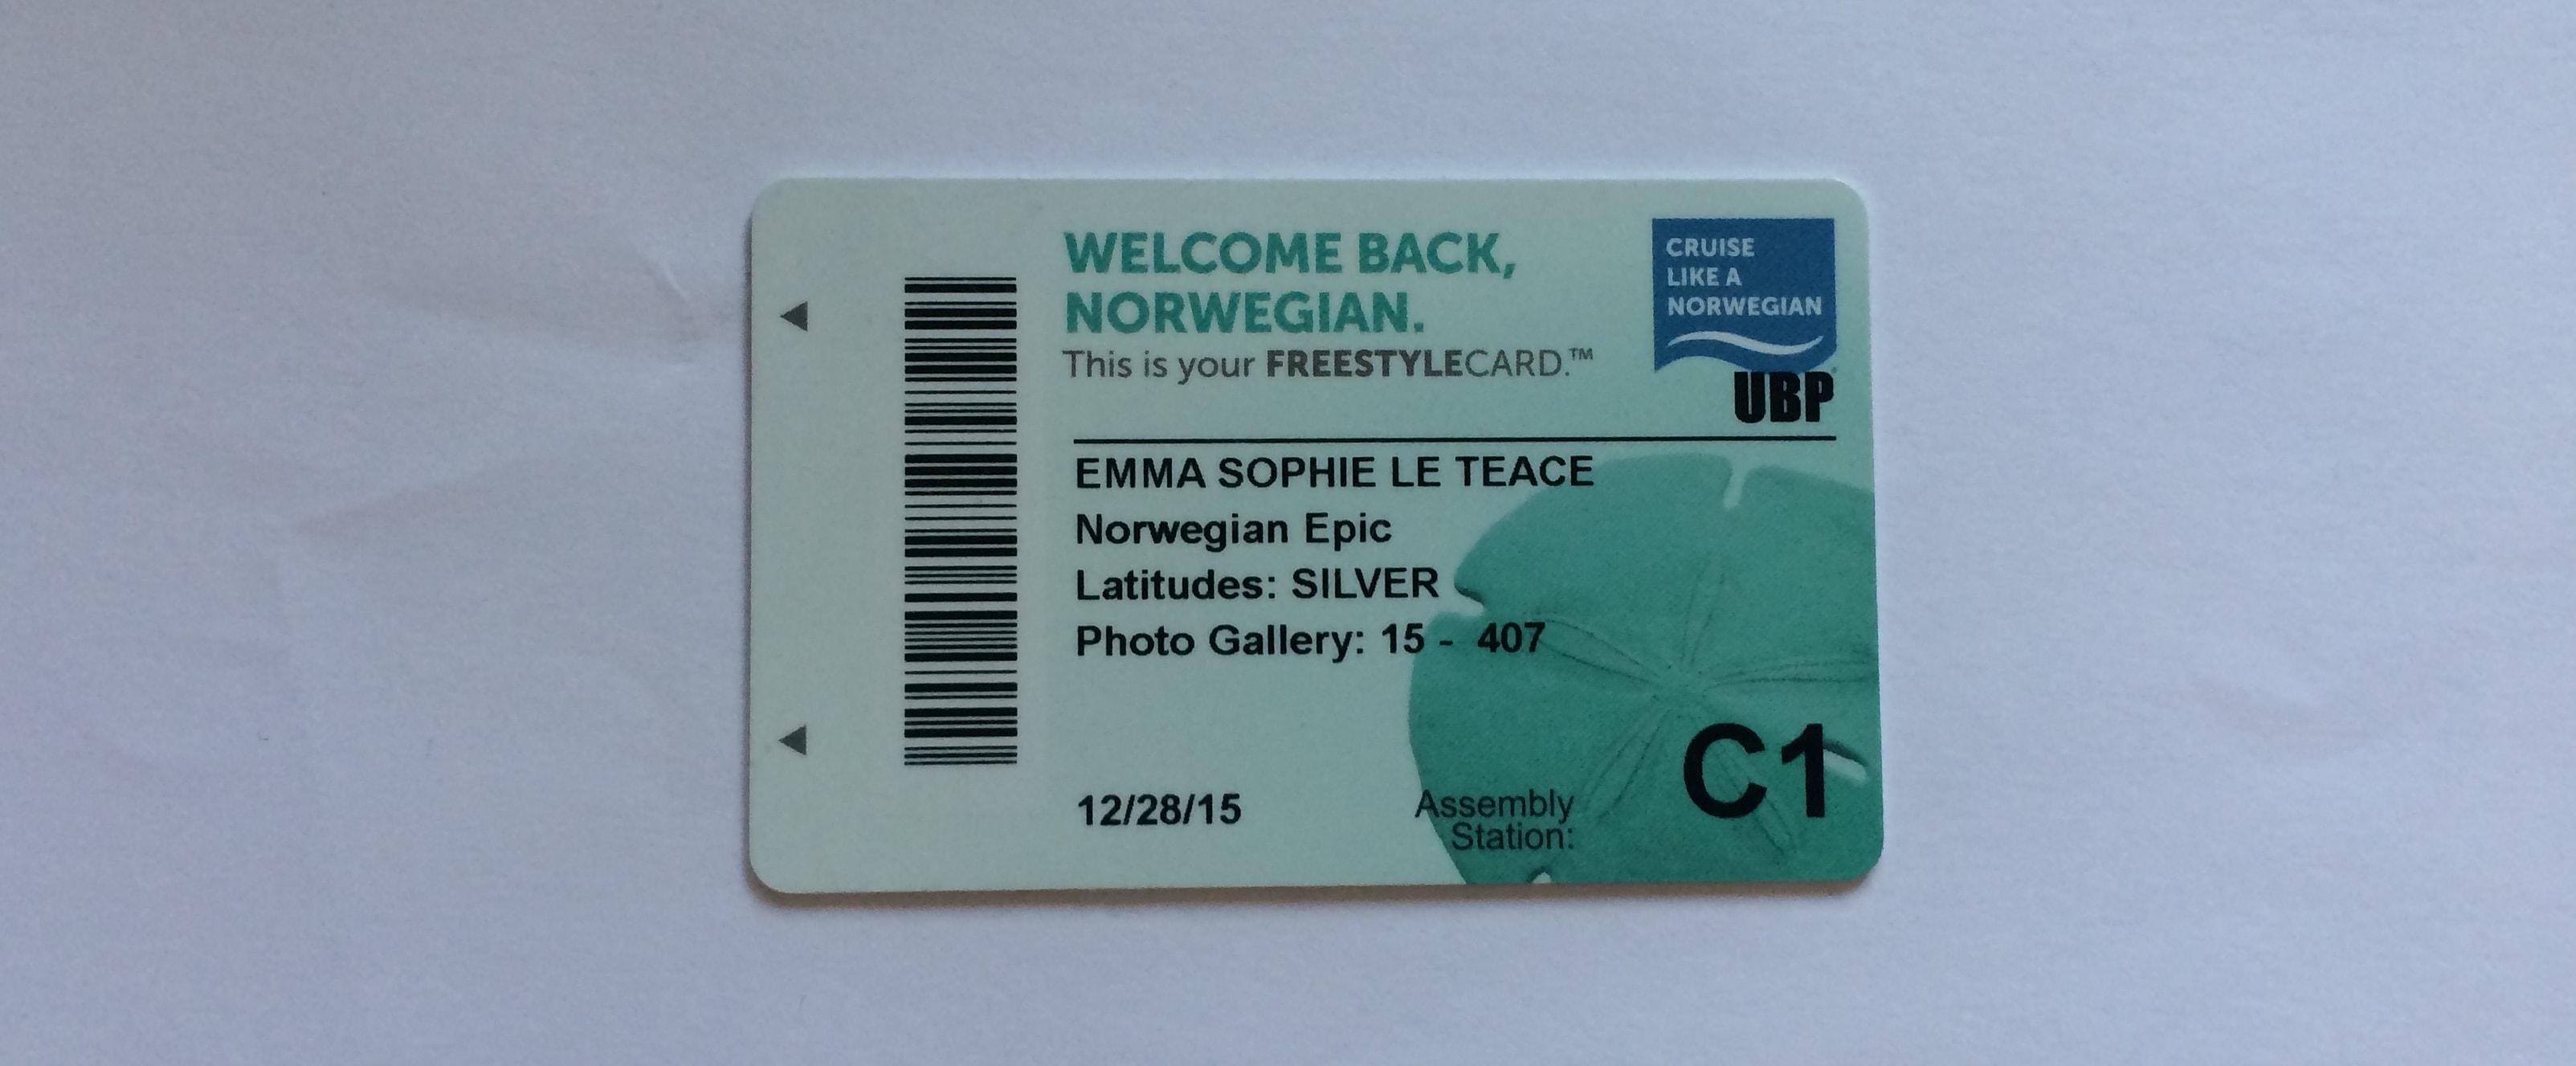 Norwegian Epic Ncl Cruise Cruising Key Card Room Key